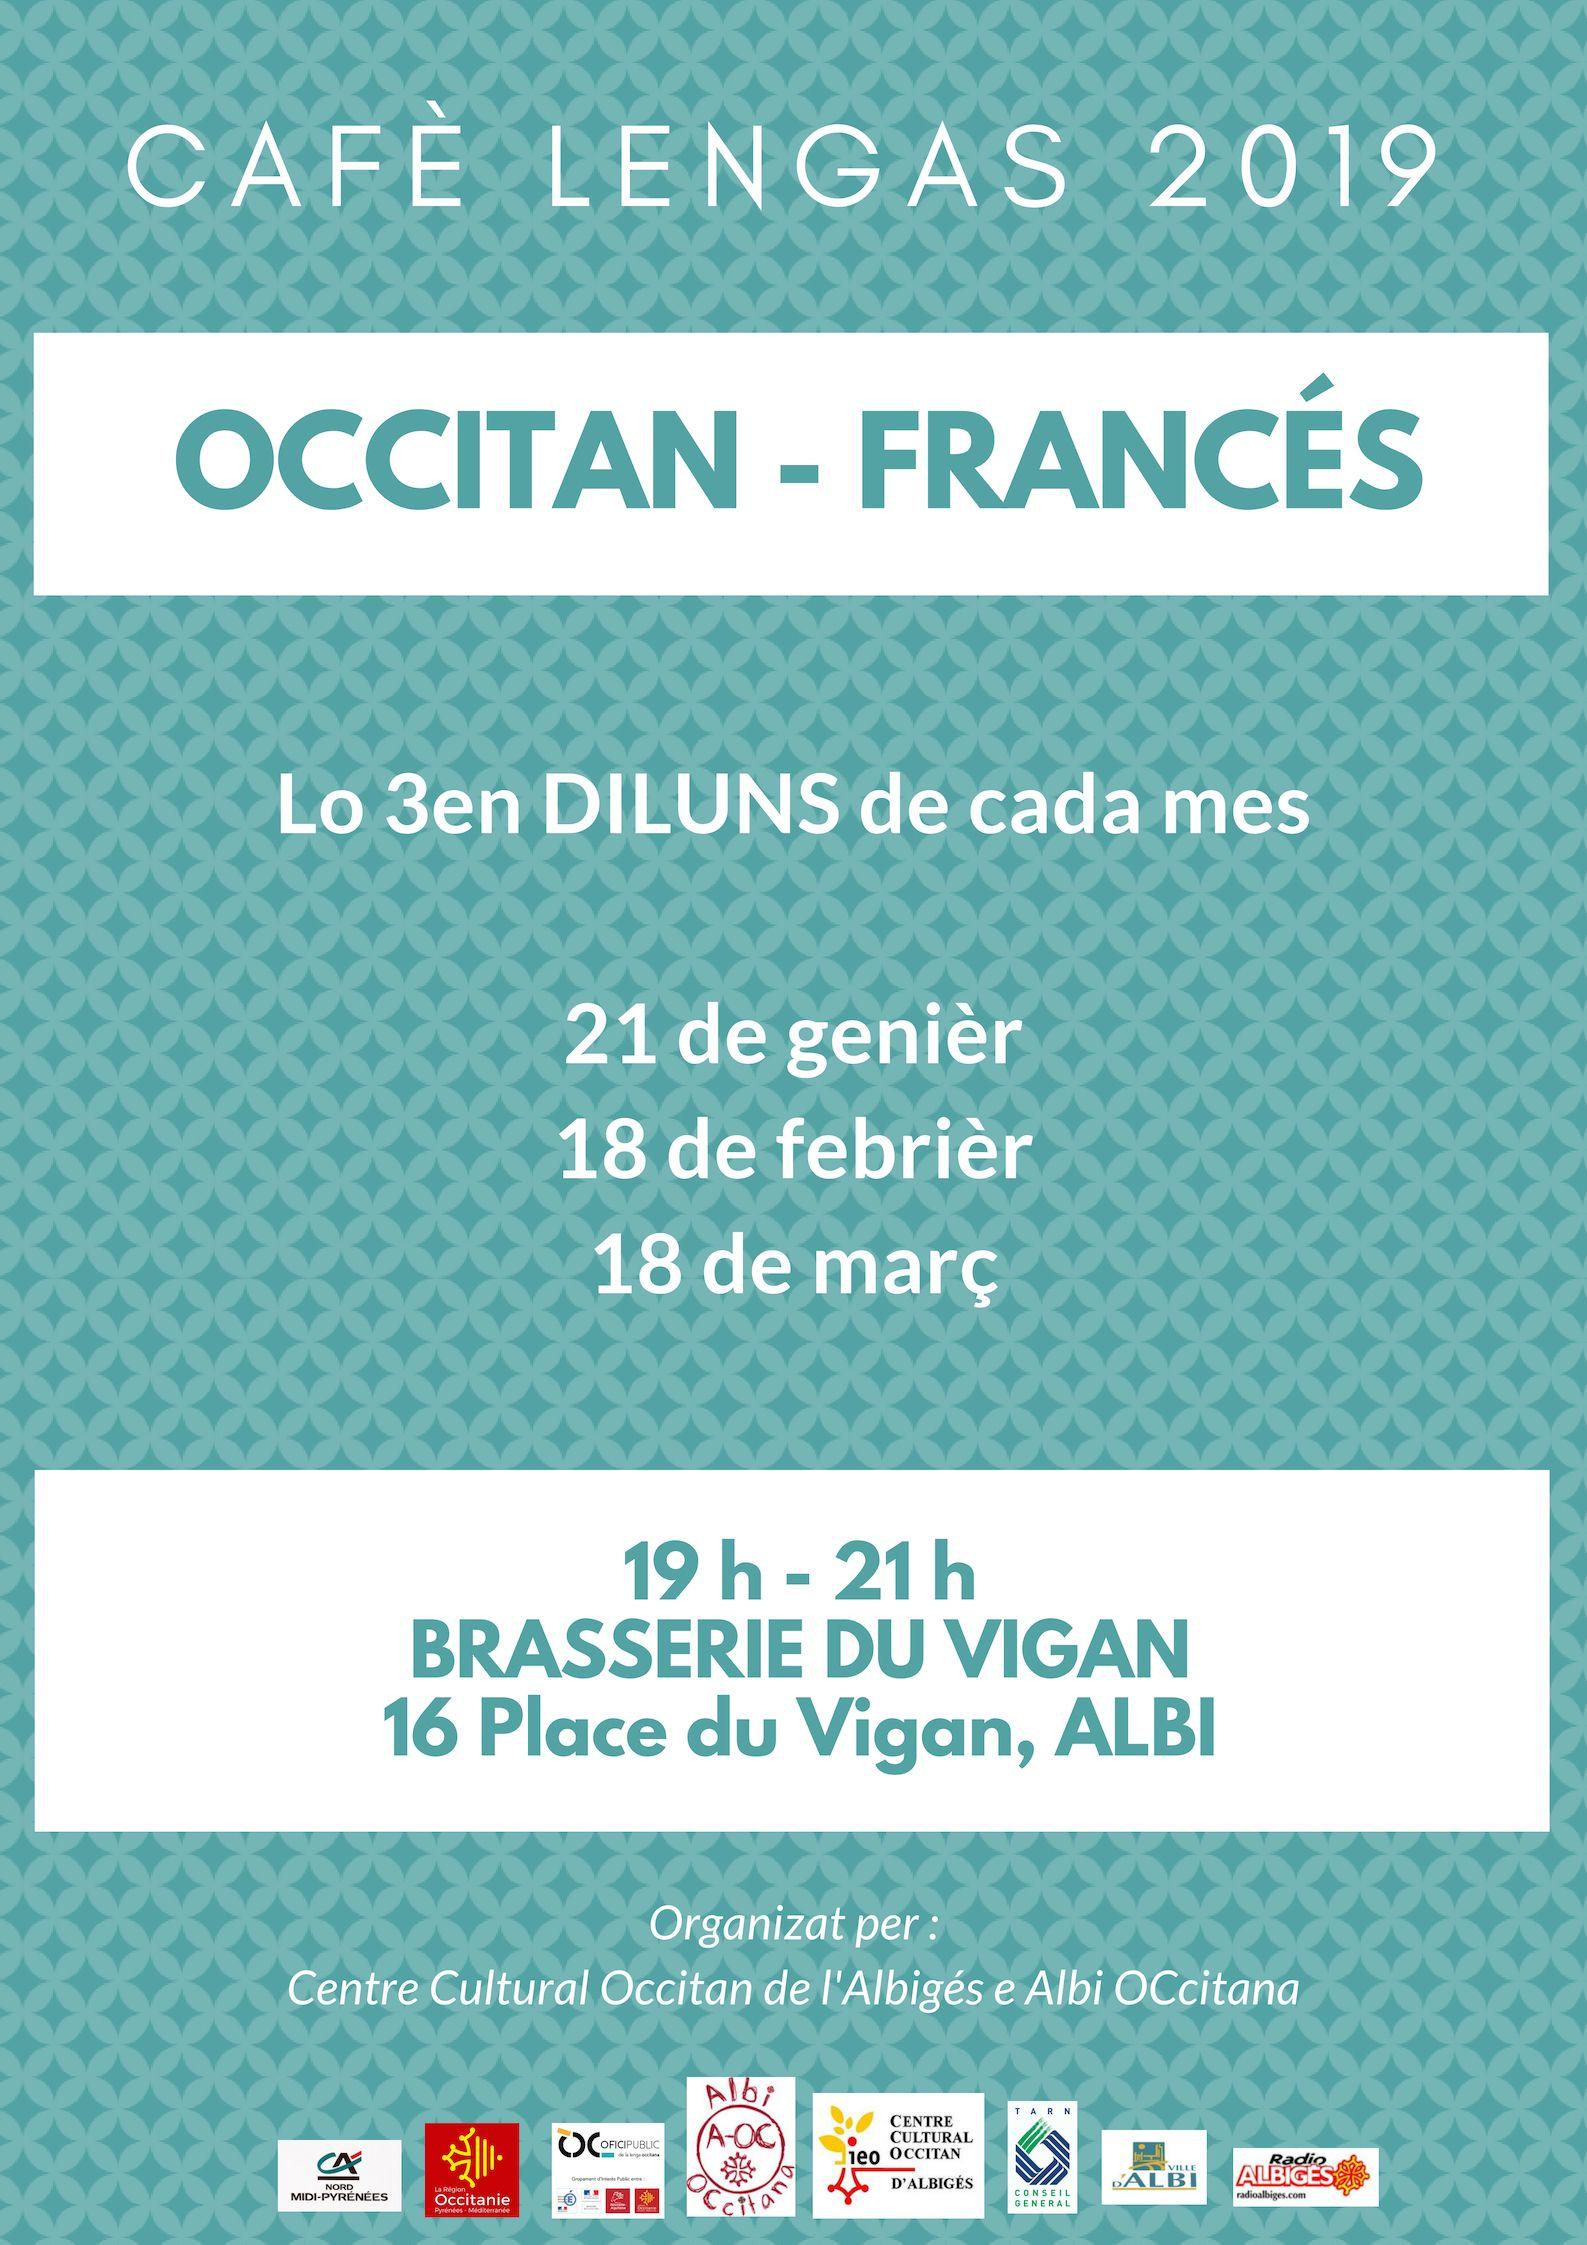 Cafè de las lengas francès/occitan 18 de març